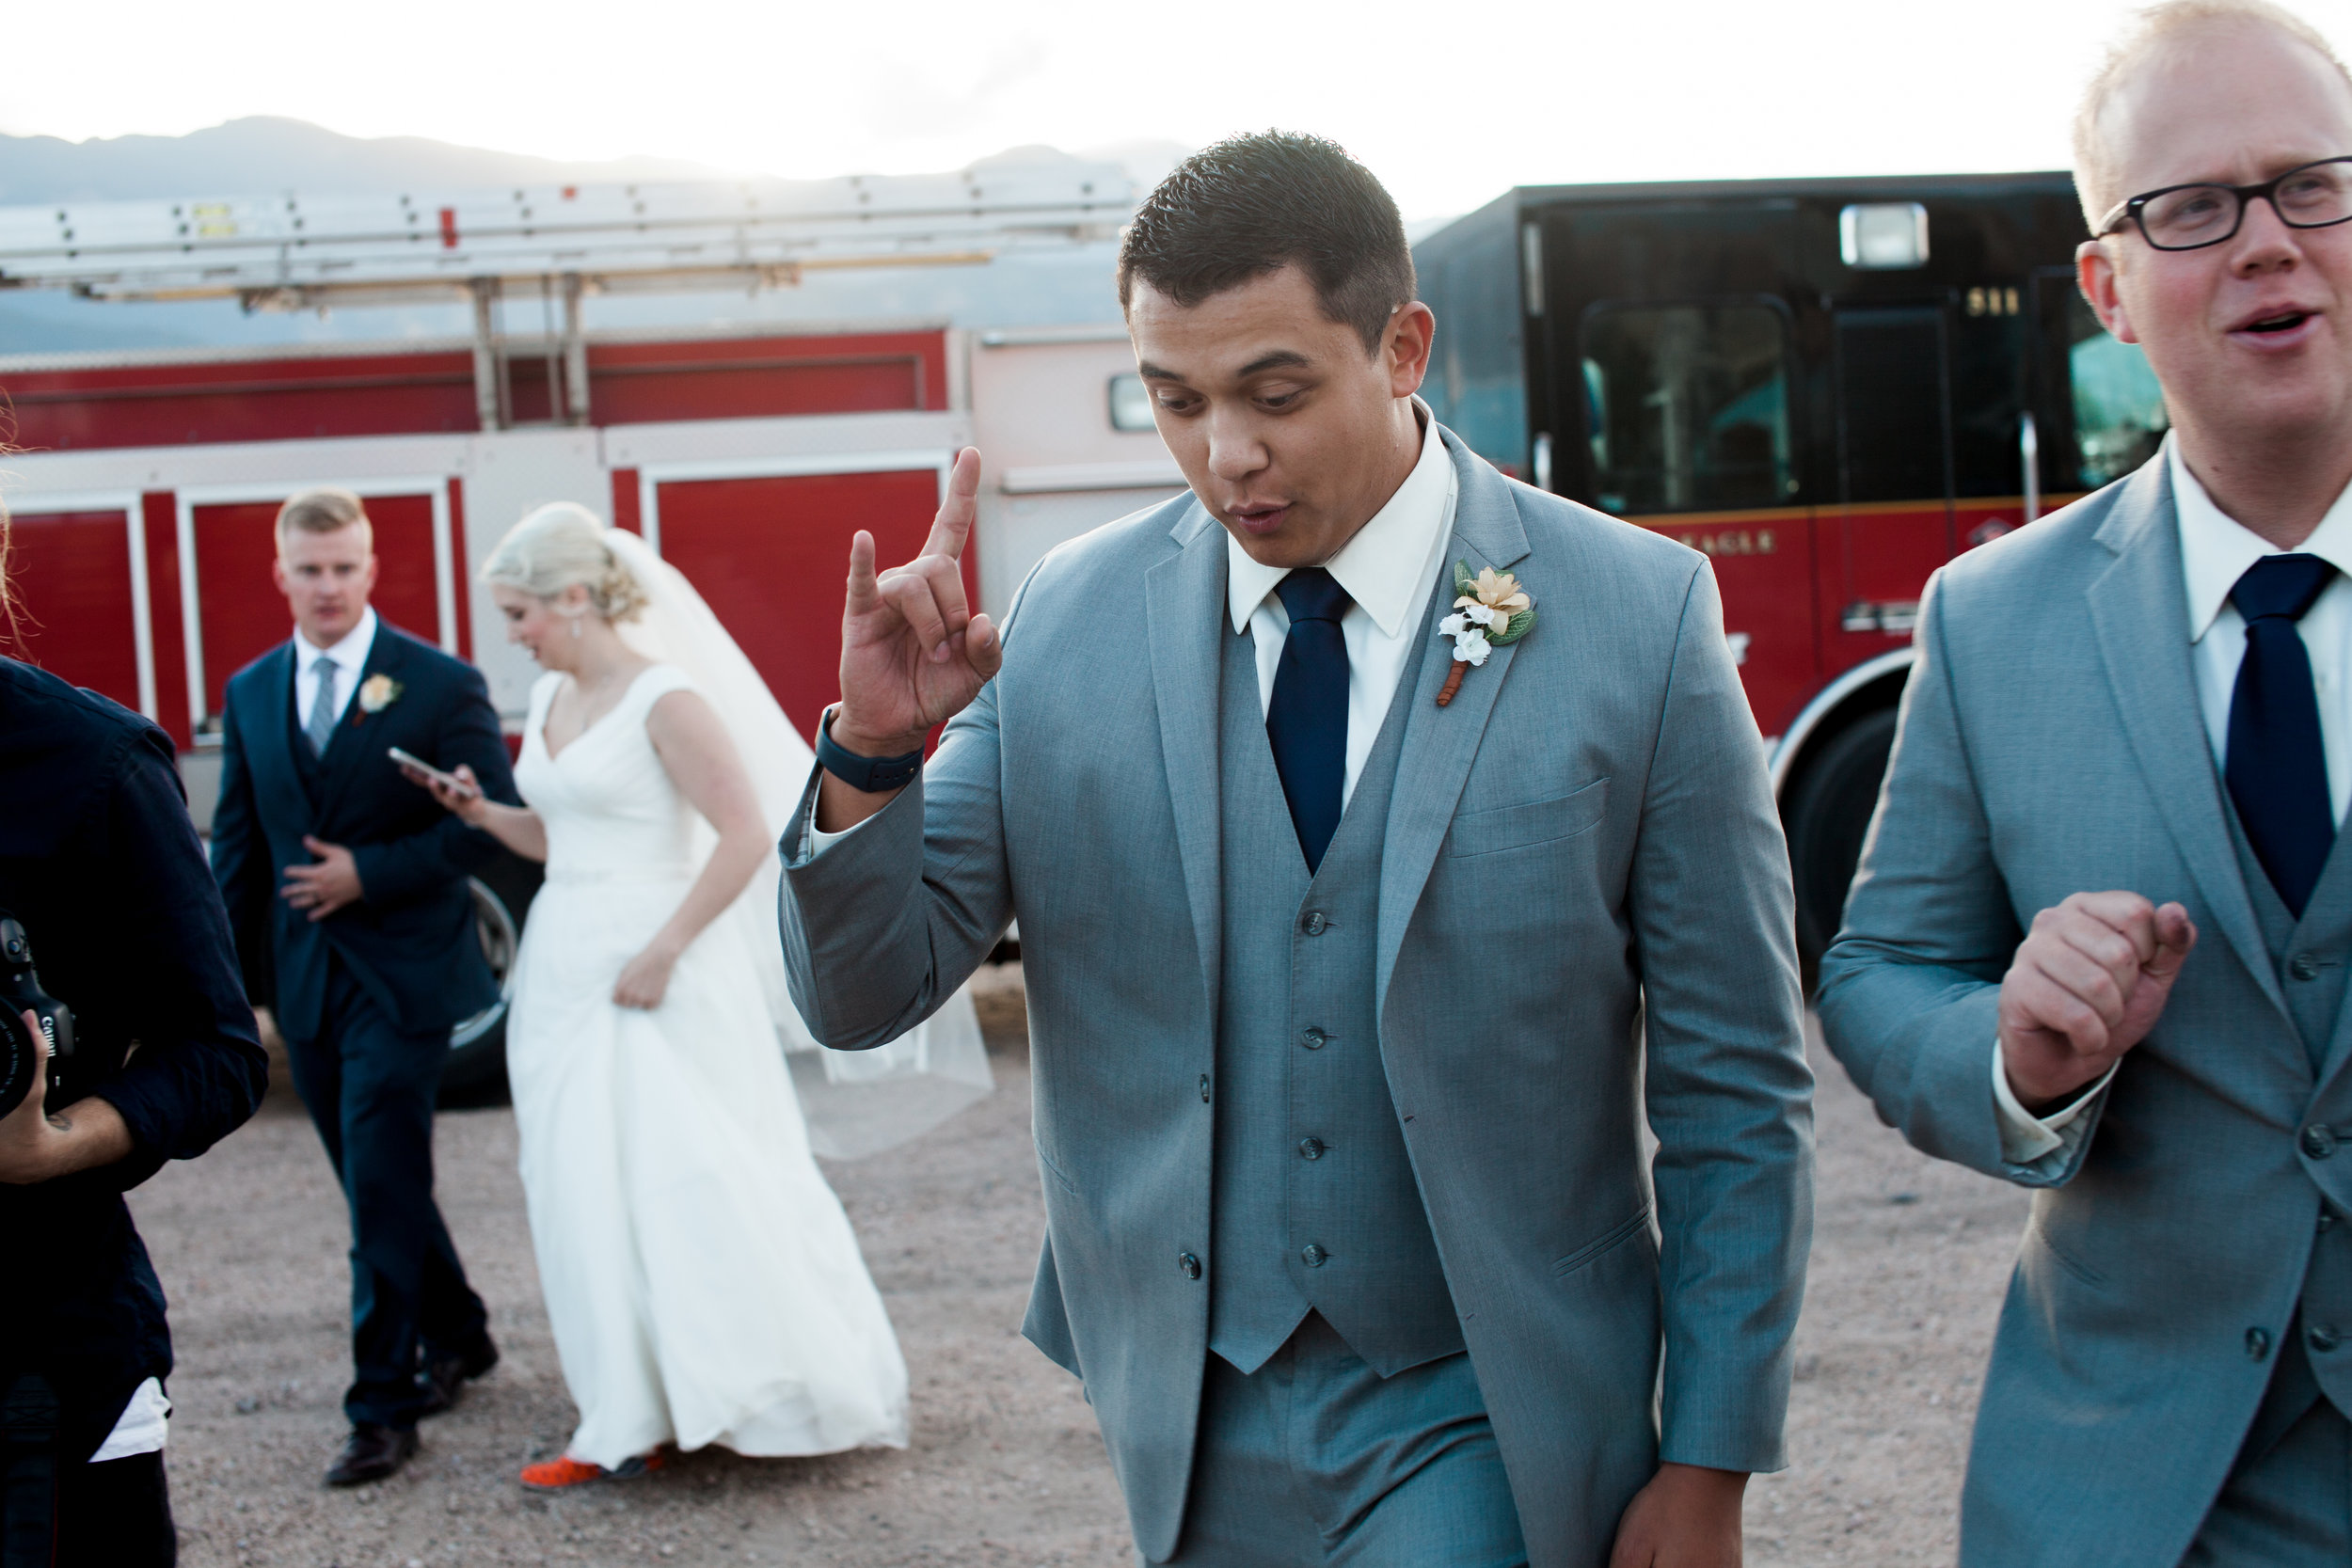 fun-wedding-photos.jpg